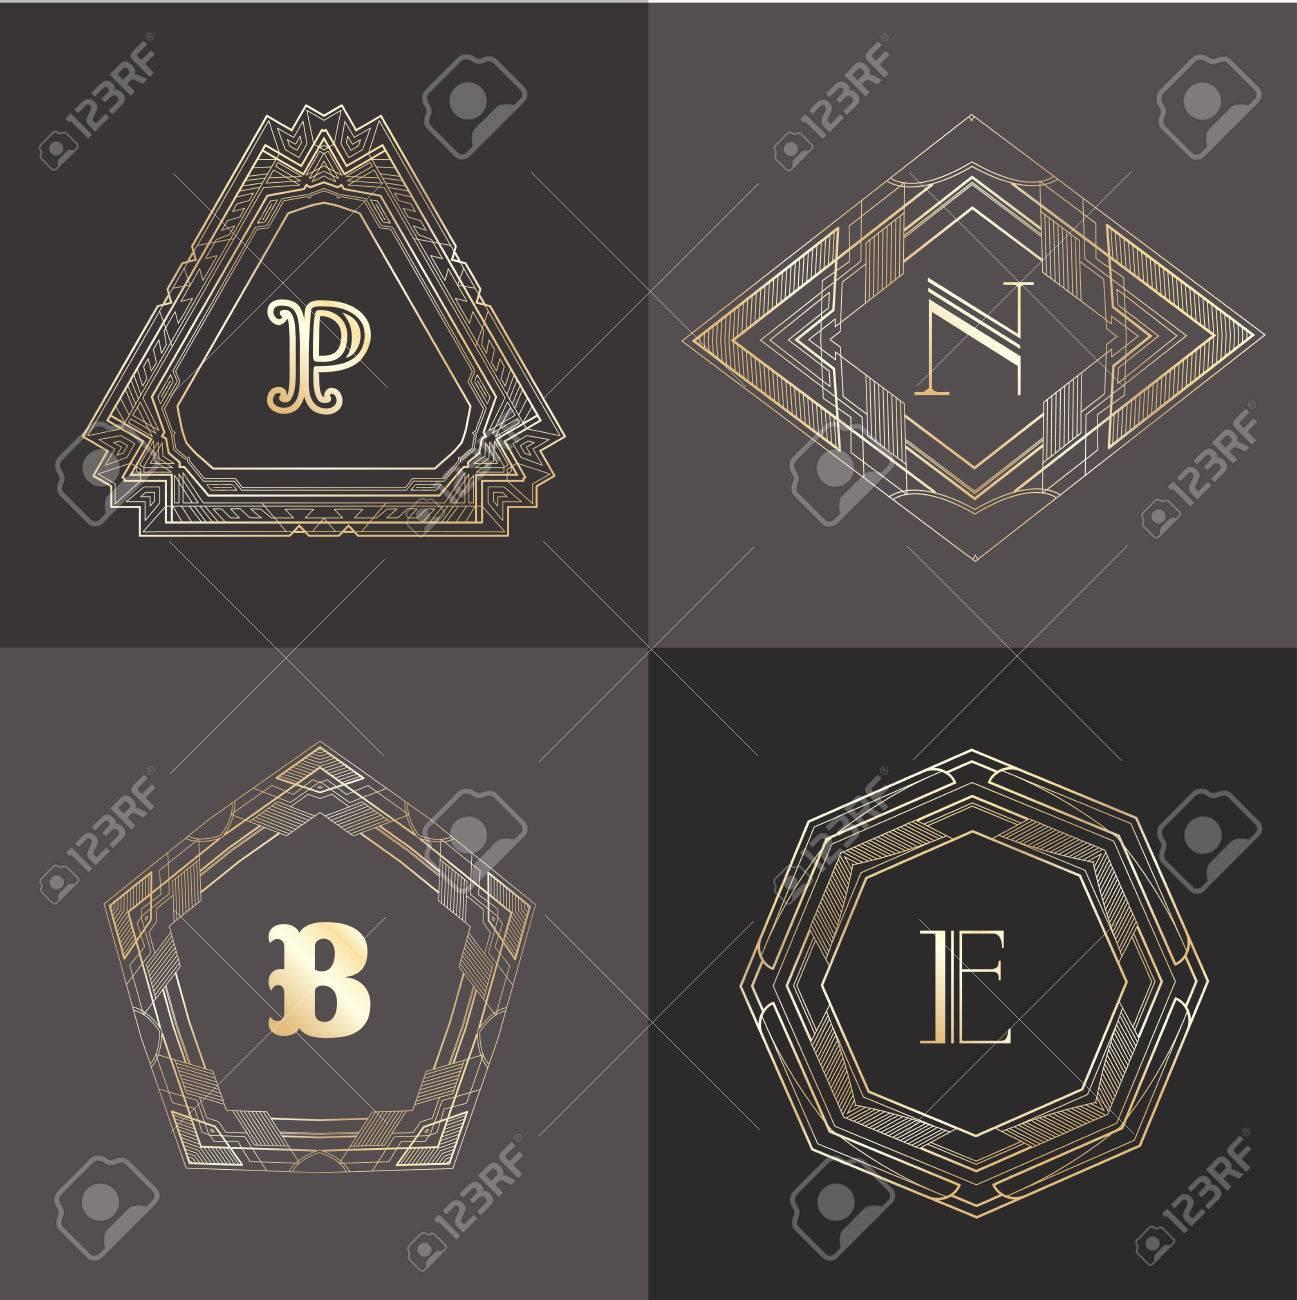 monogram template with calligraphic elegant ornament identity